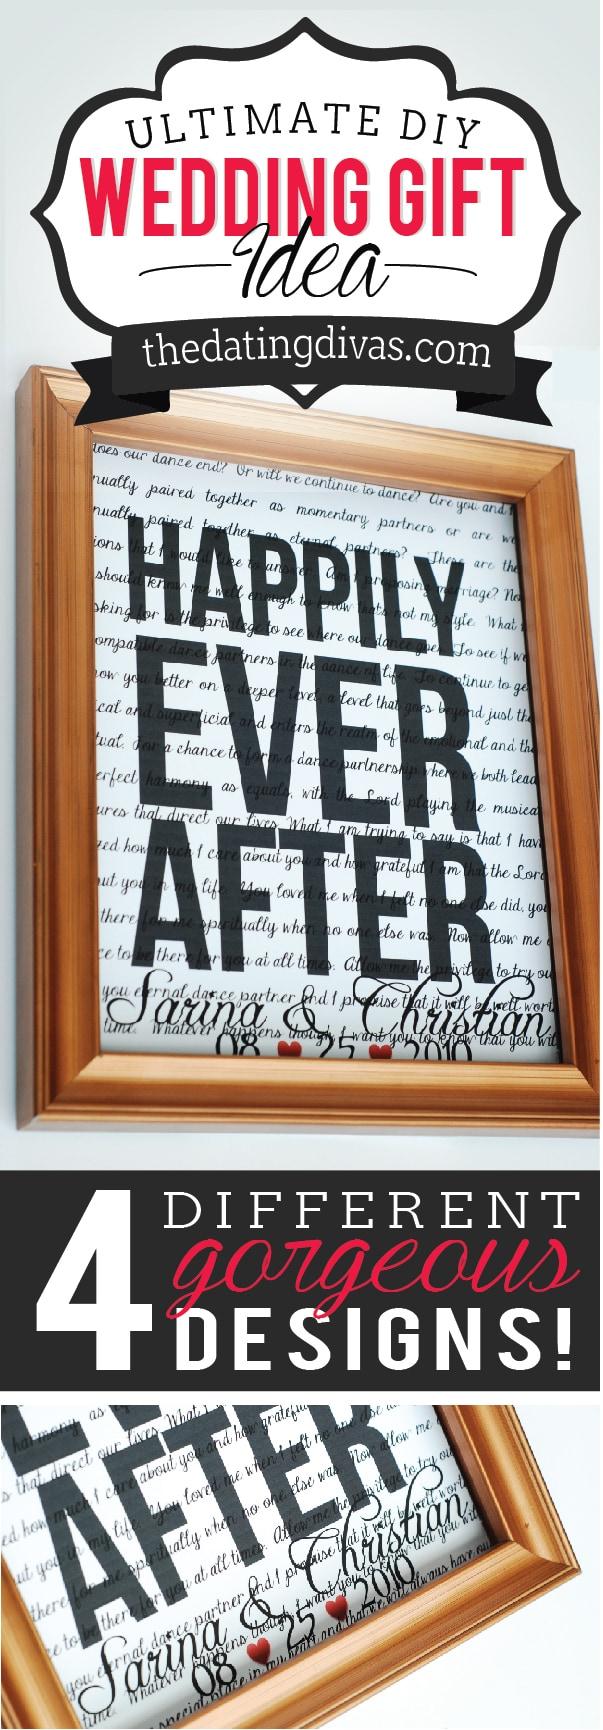 Wedding Gift Pinterest Picture